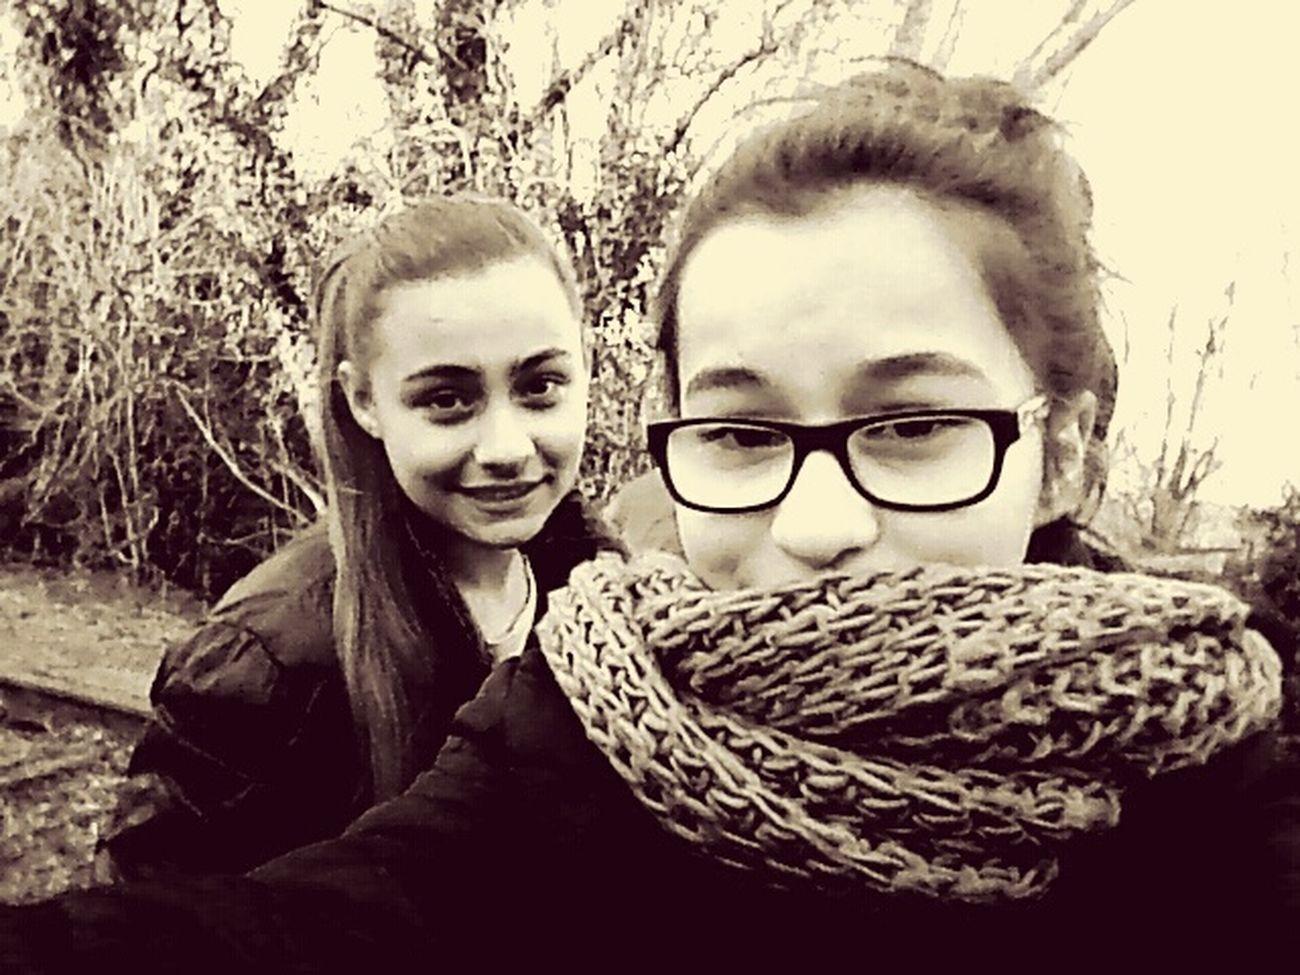 Ma princesse , je t'aime tellement , tu es comme ma petite soeur je taime fort bibou <3 I Love You !